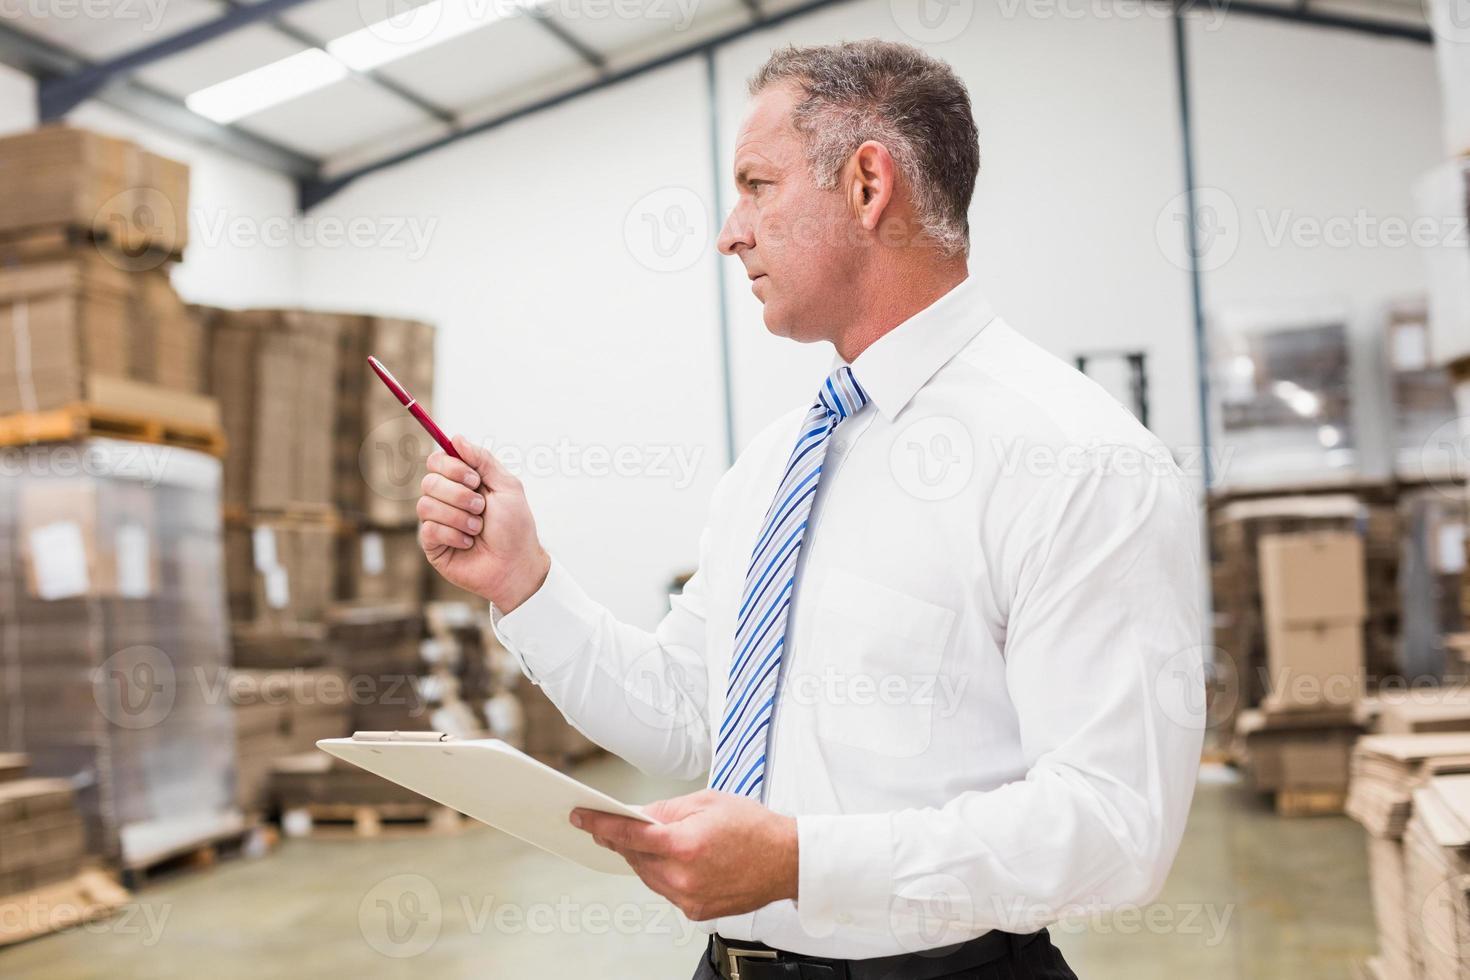 Warehouse boss checking his inventor photo